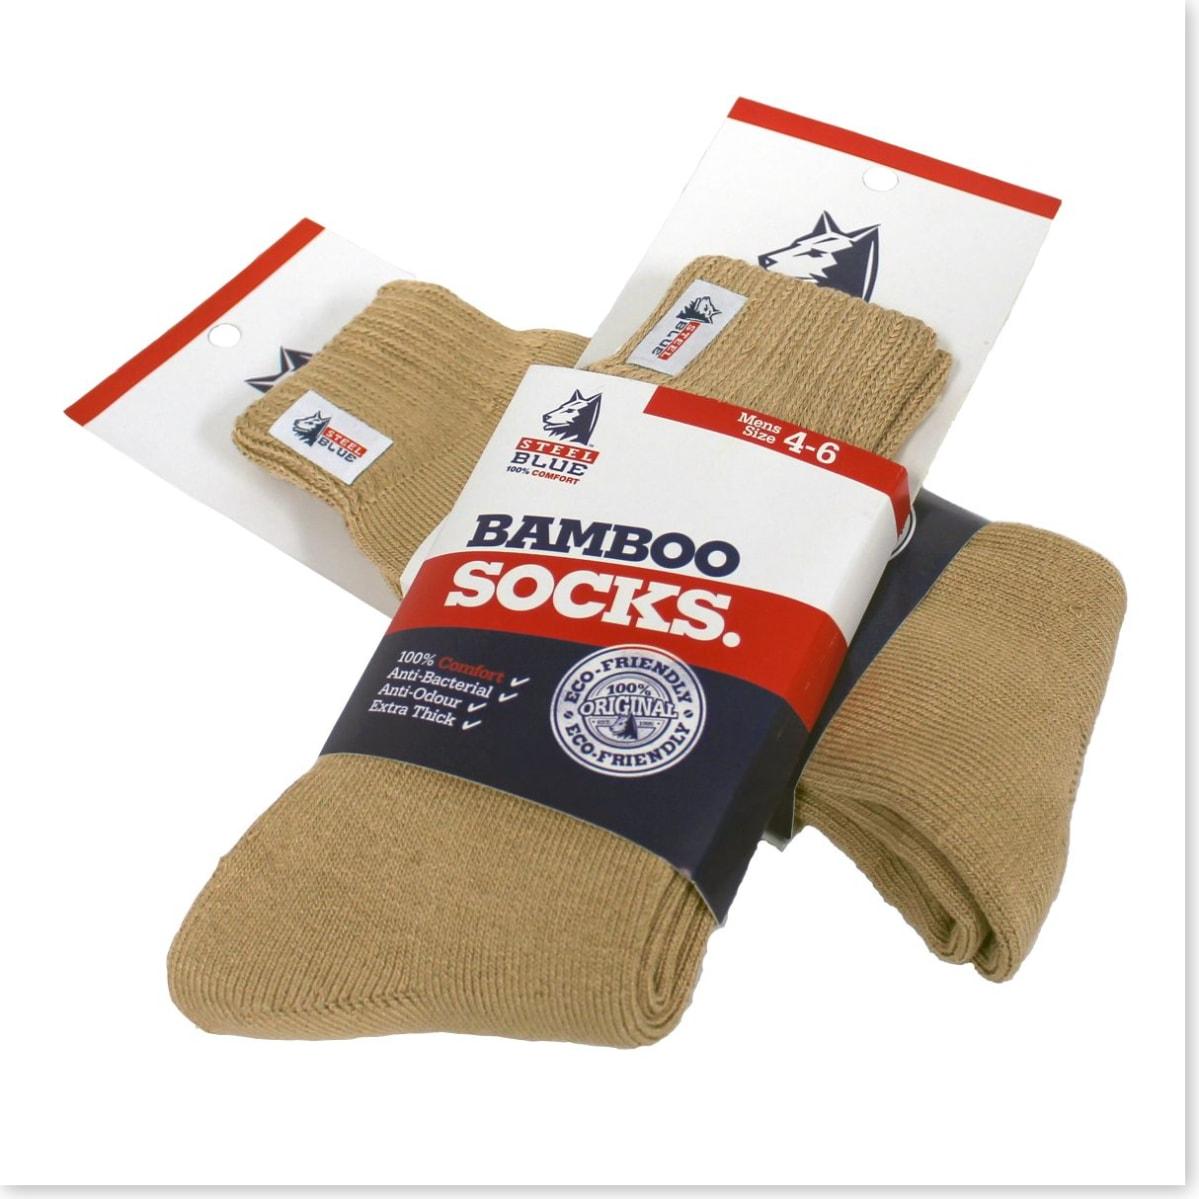 Bamboo Socks - Sand Boot